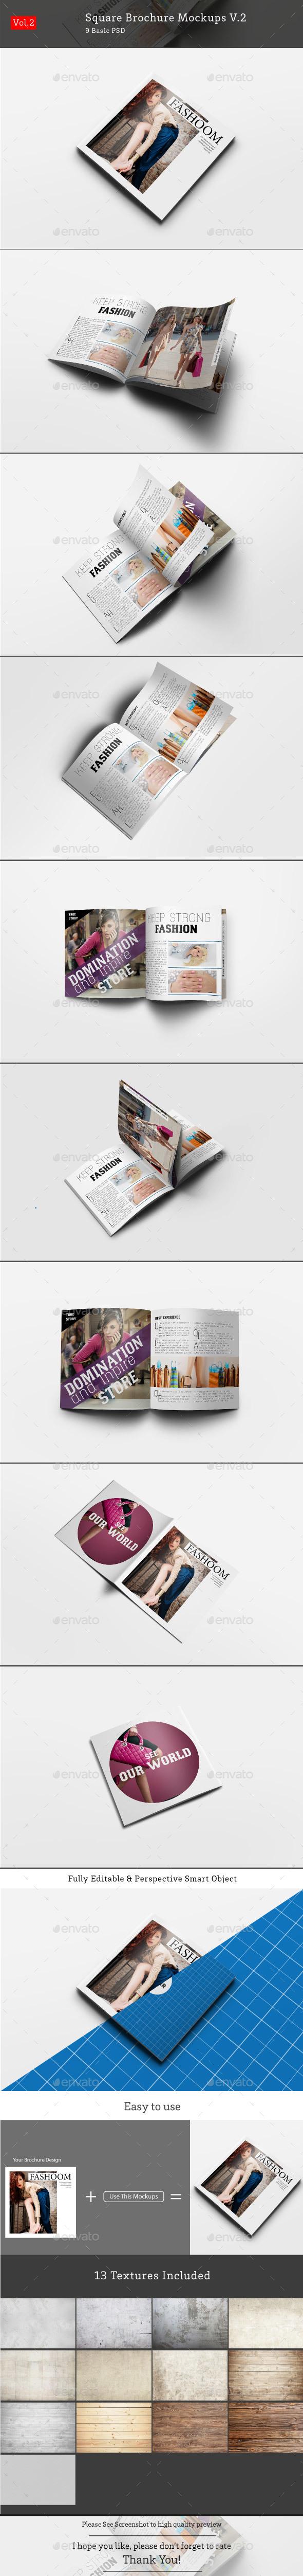 Square Brochure Mockups V.2 - Brochures Print